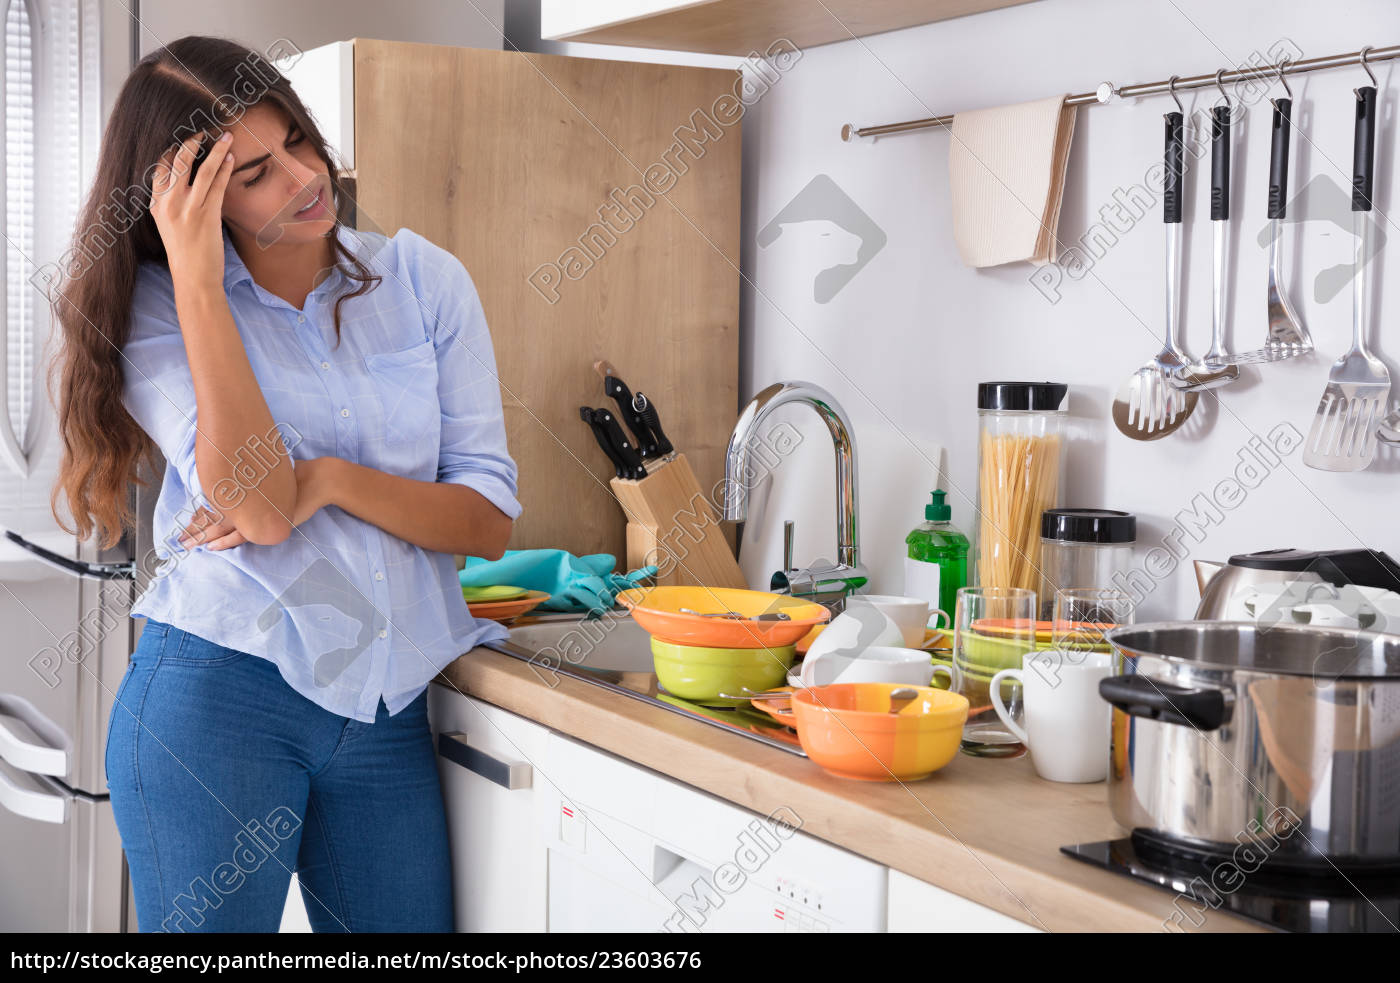 woman, standing, near, kitchen, sink, looking - 23603676